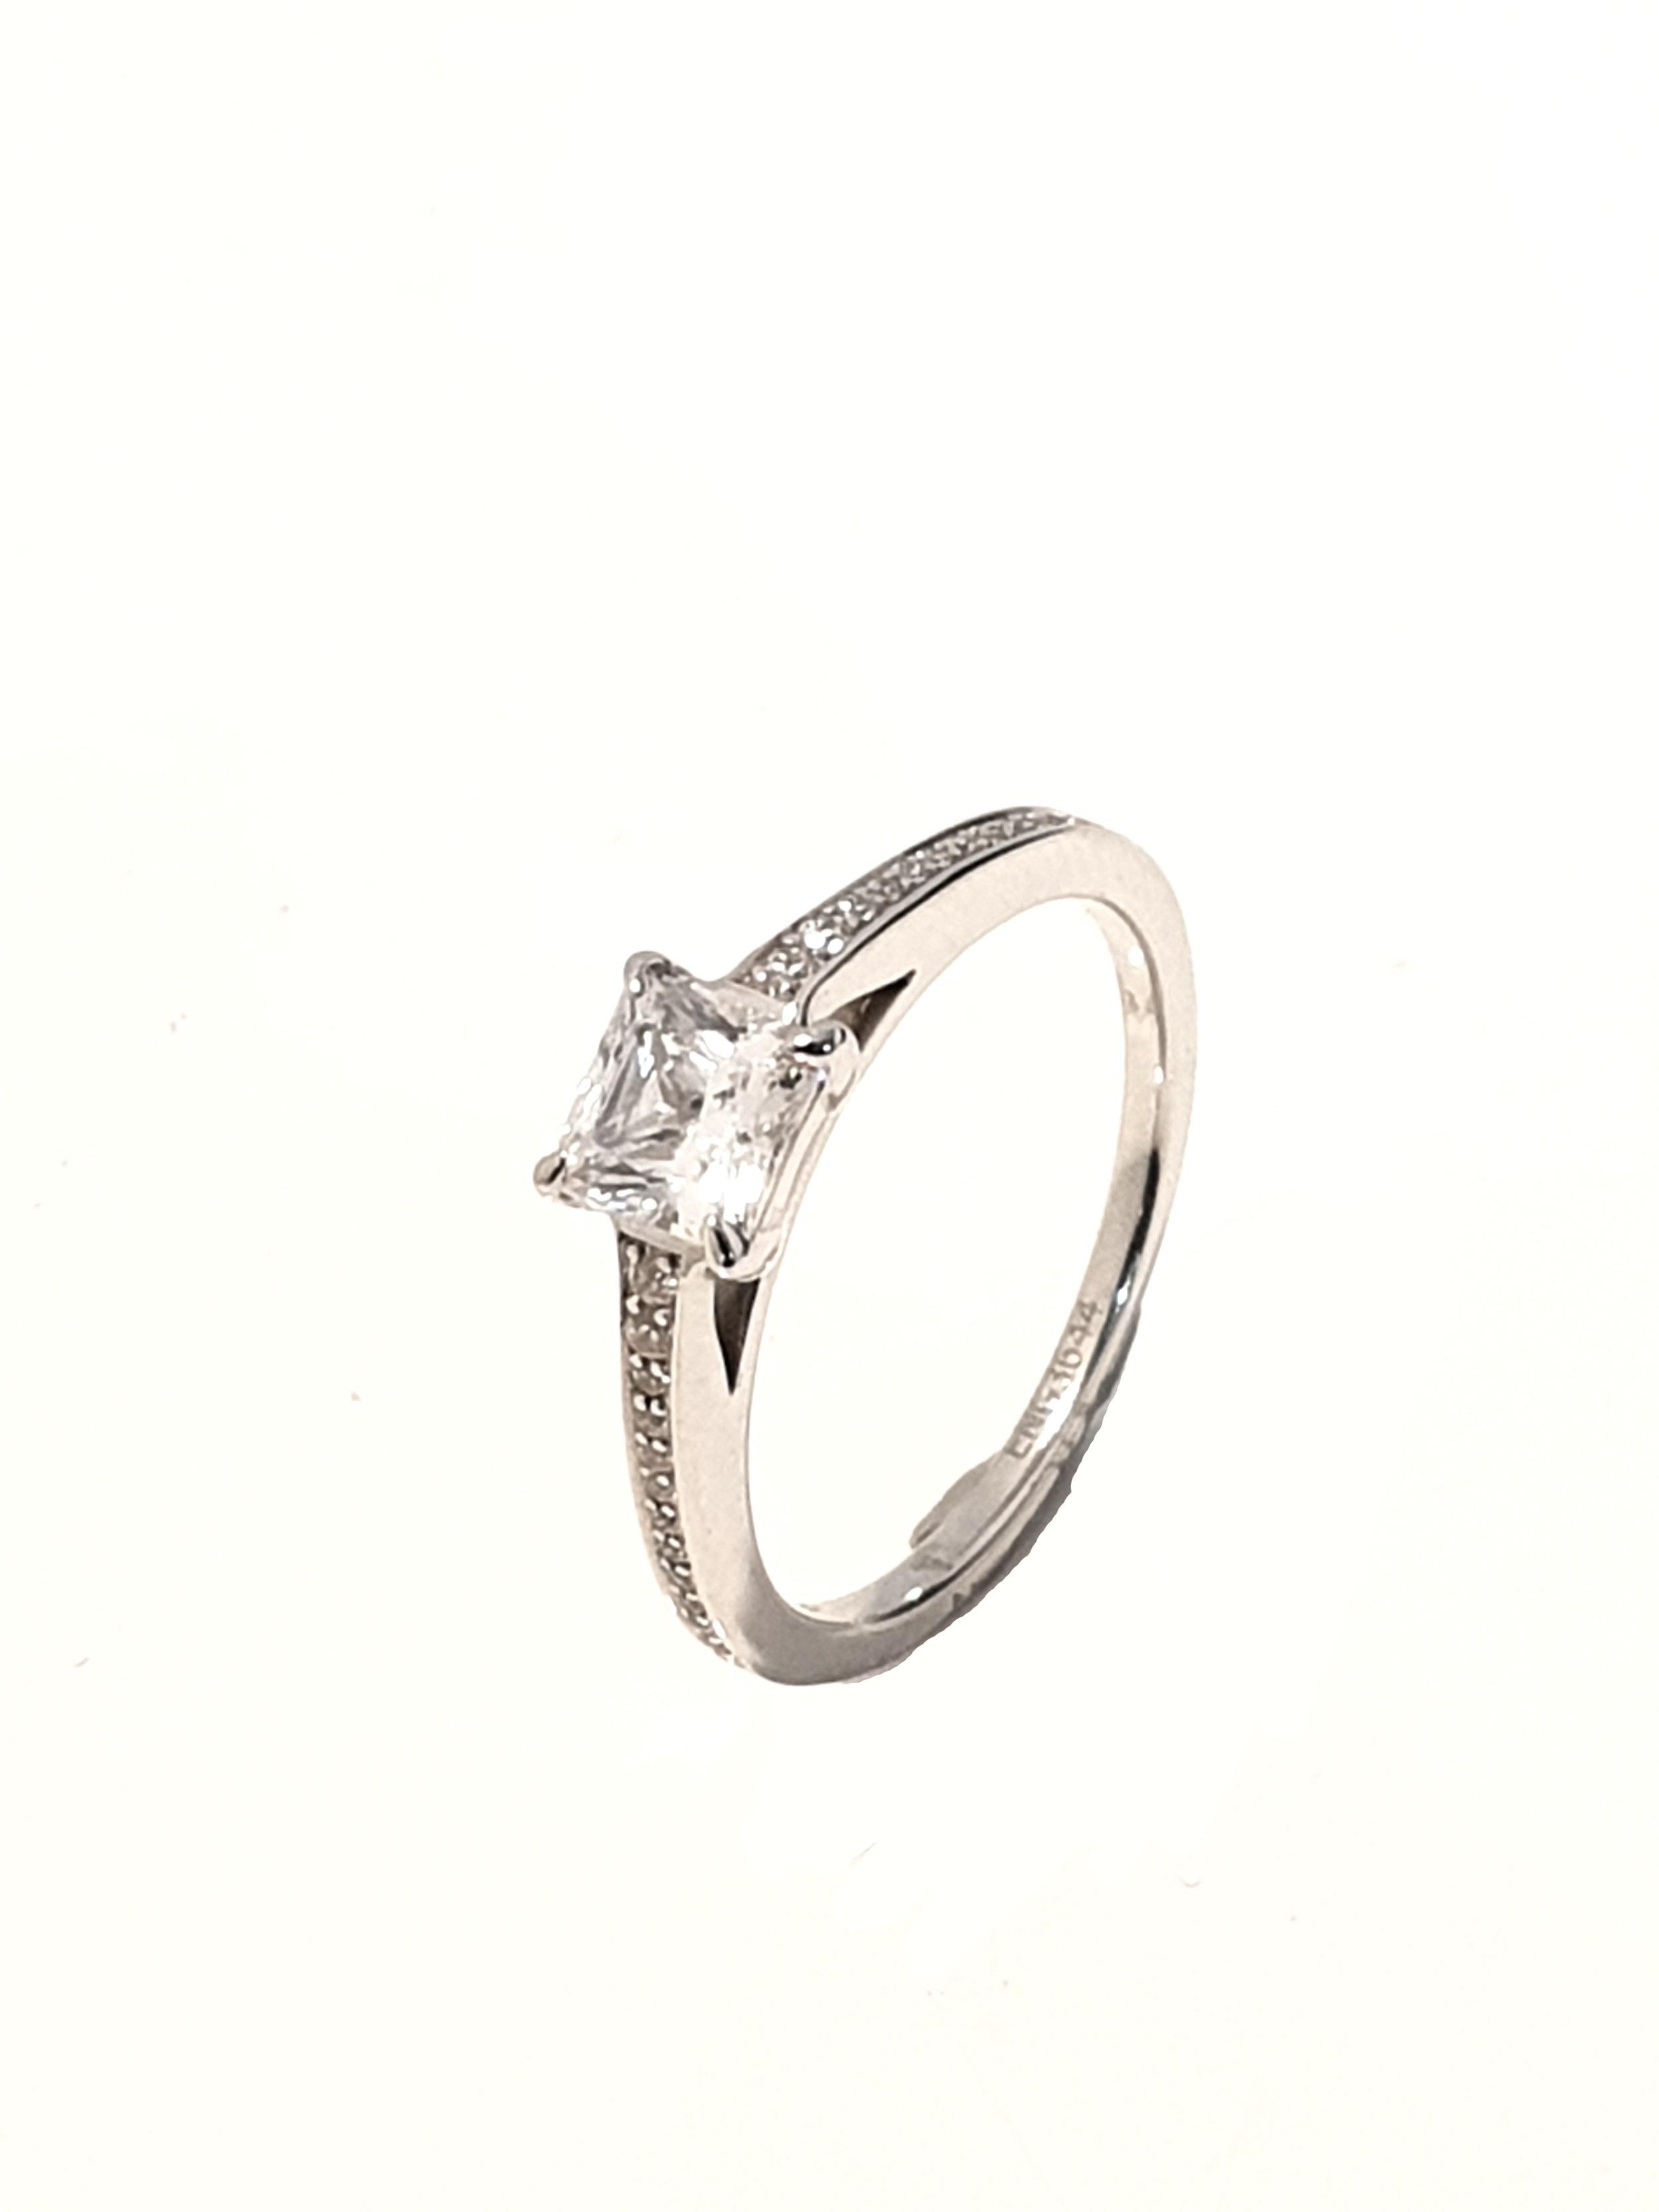 495bedb7c0f8d Single Stone — George Banks Jewellers